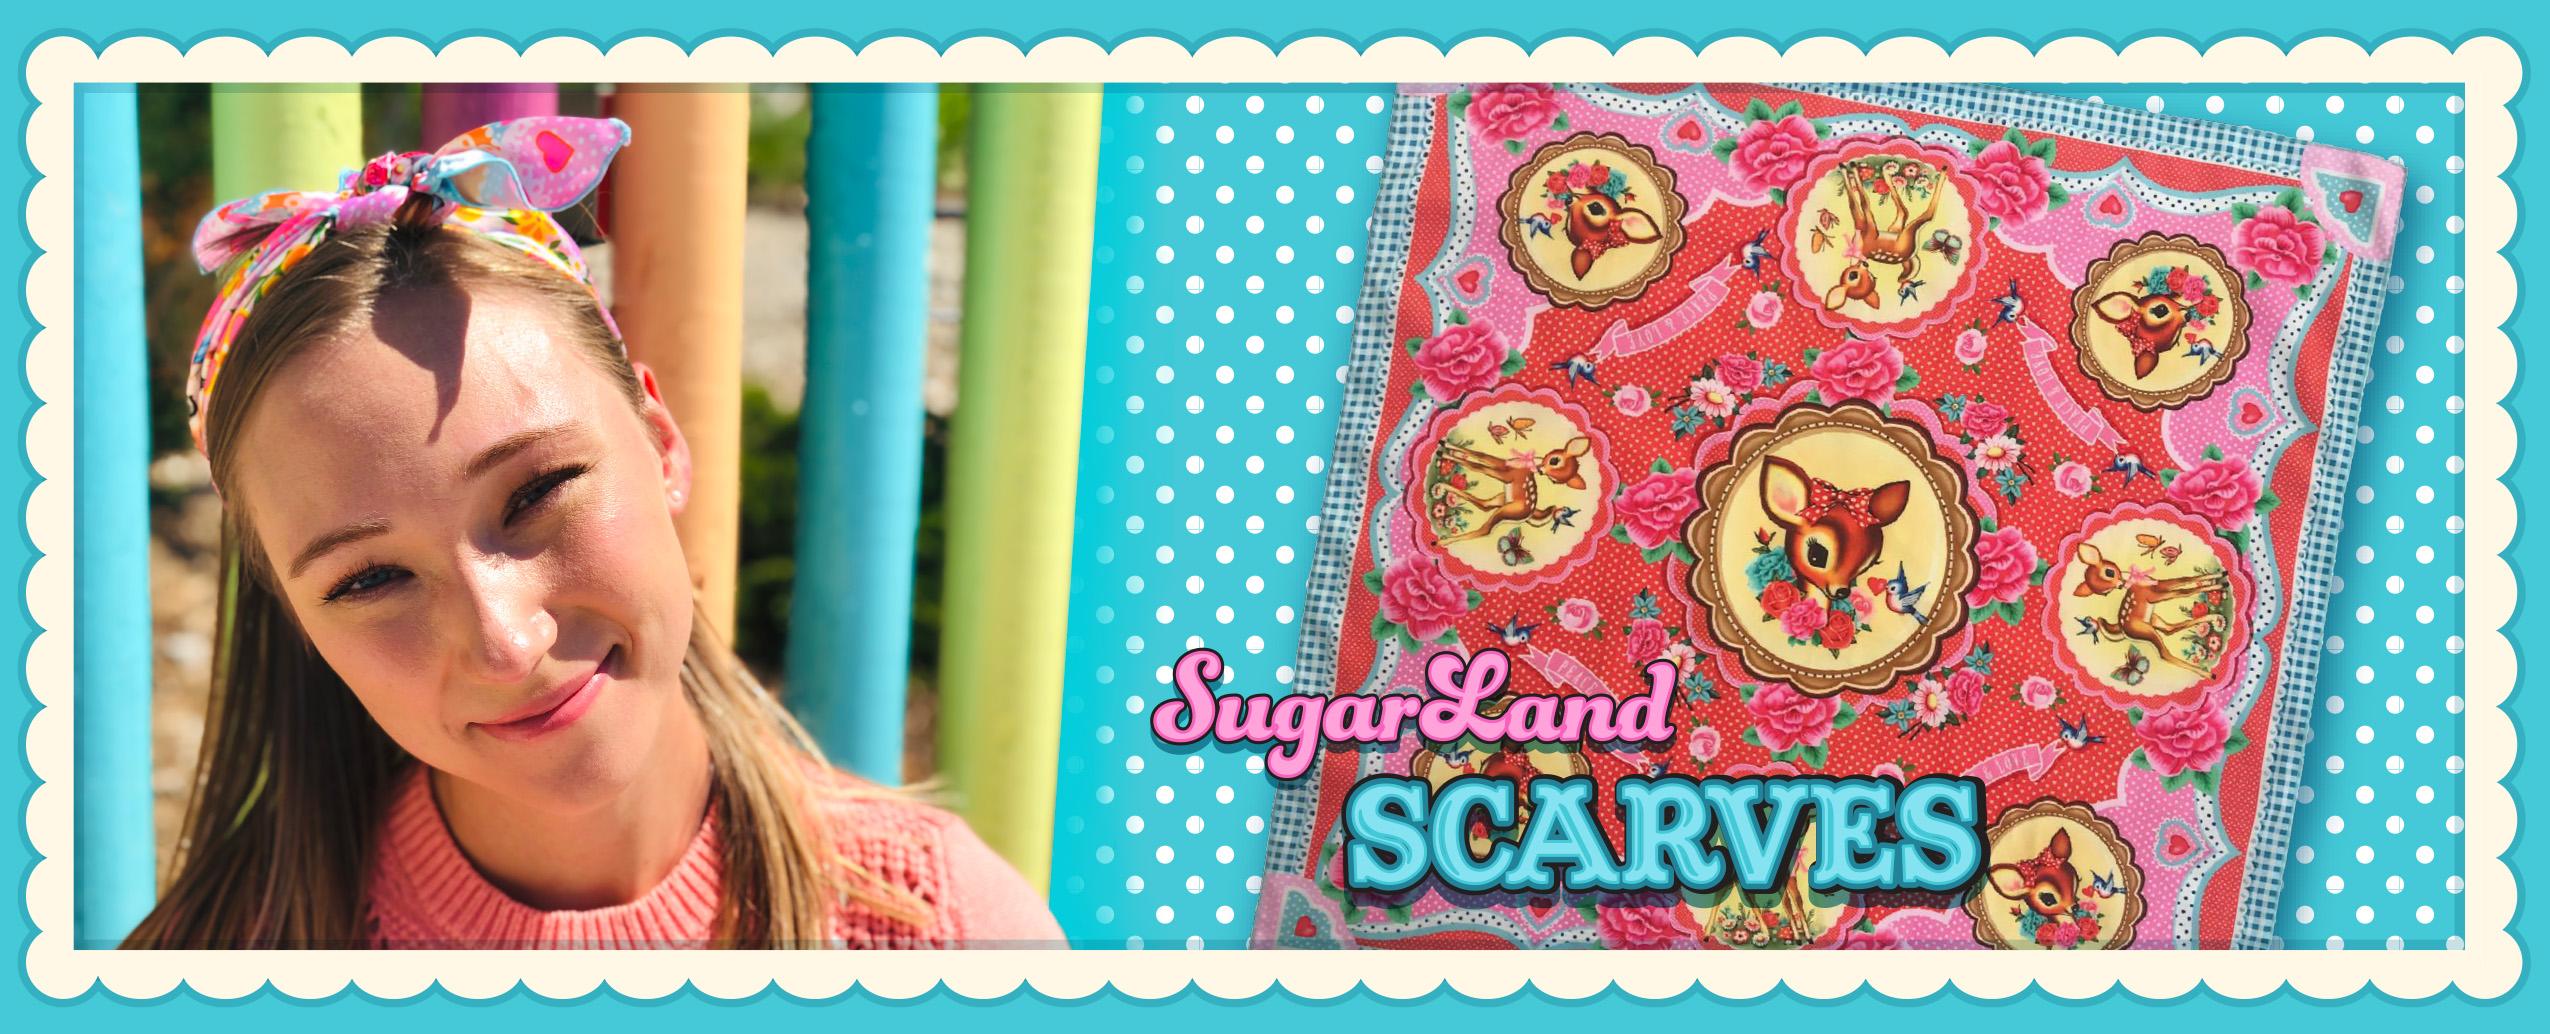 sugarland-catagory-scarves-rev.jpg